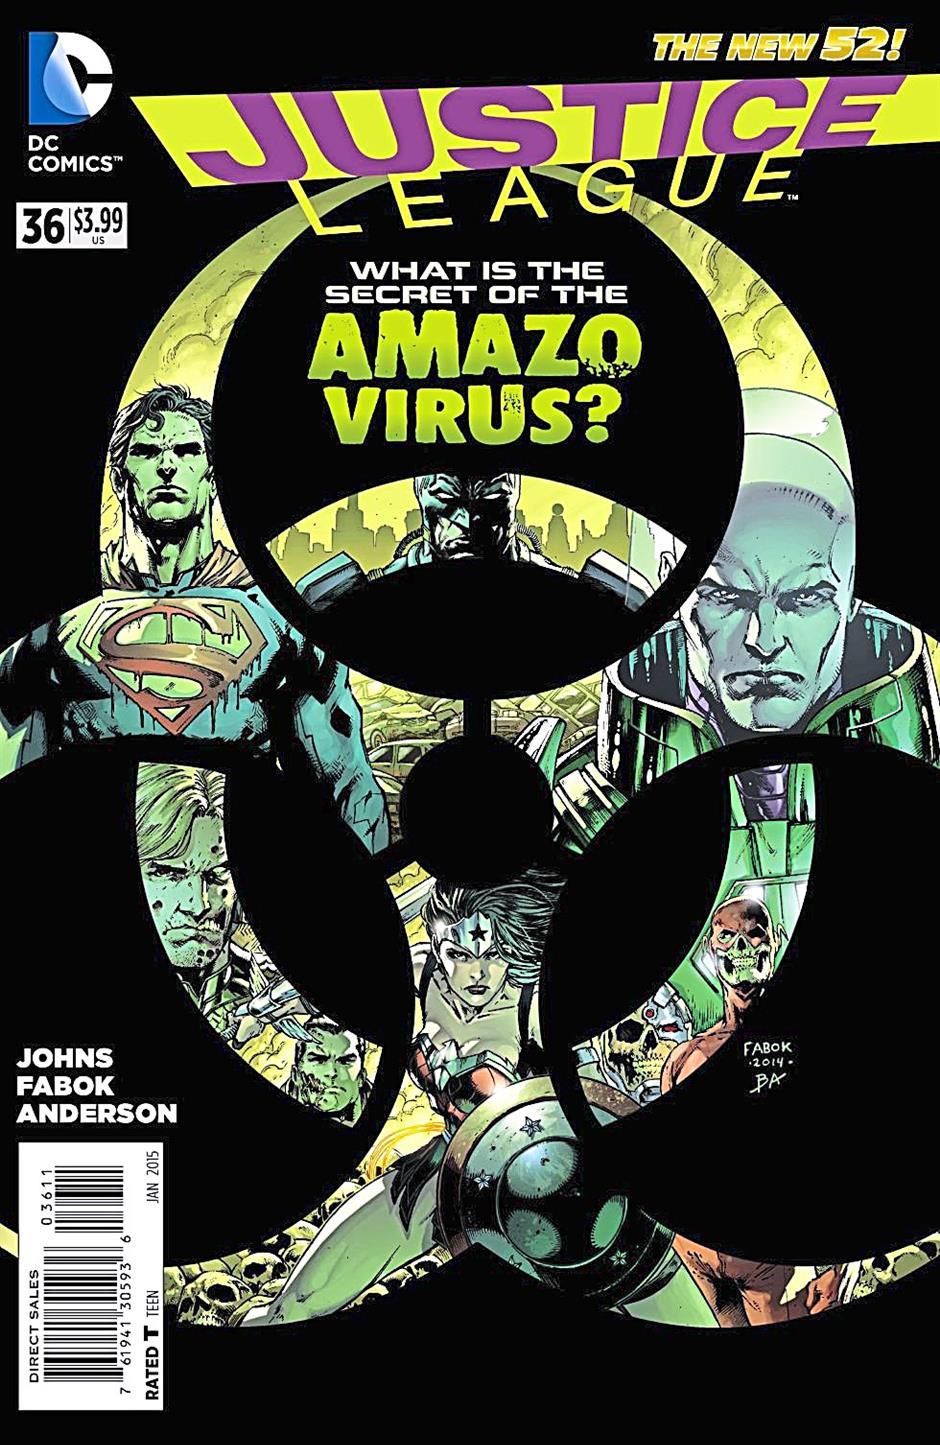 Justice League 36 kicks off the Amazo Virus story arc